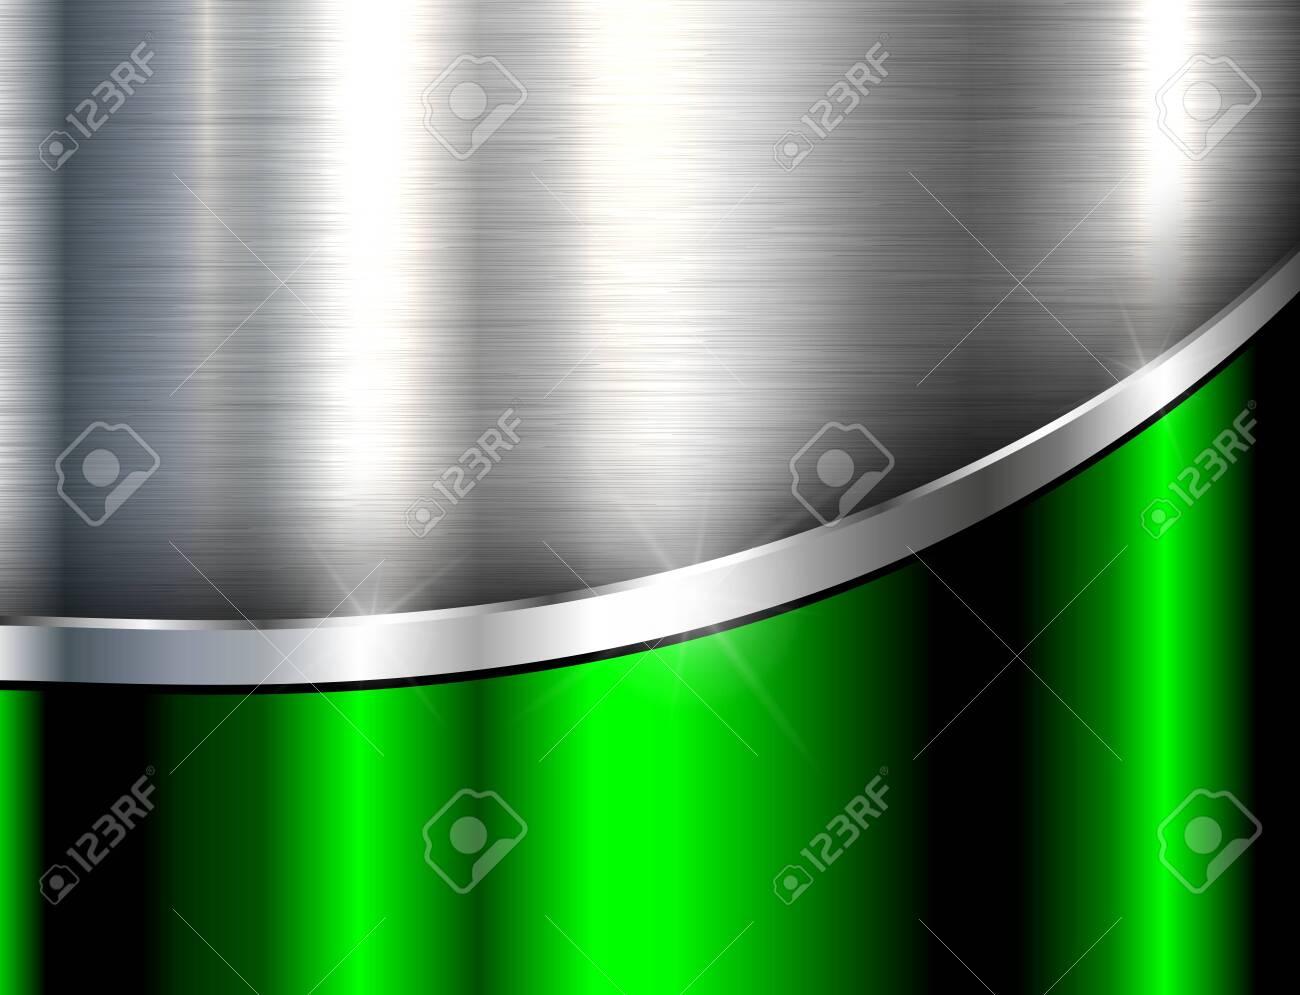 Metallic background silver green, polished steel texture, vector design. - 129940816